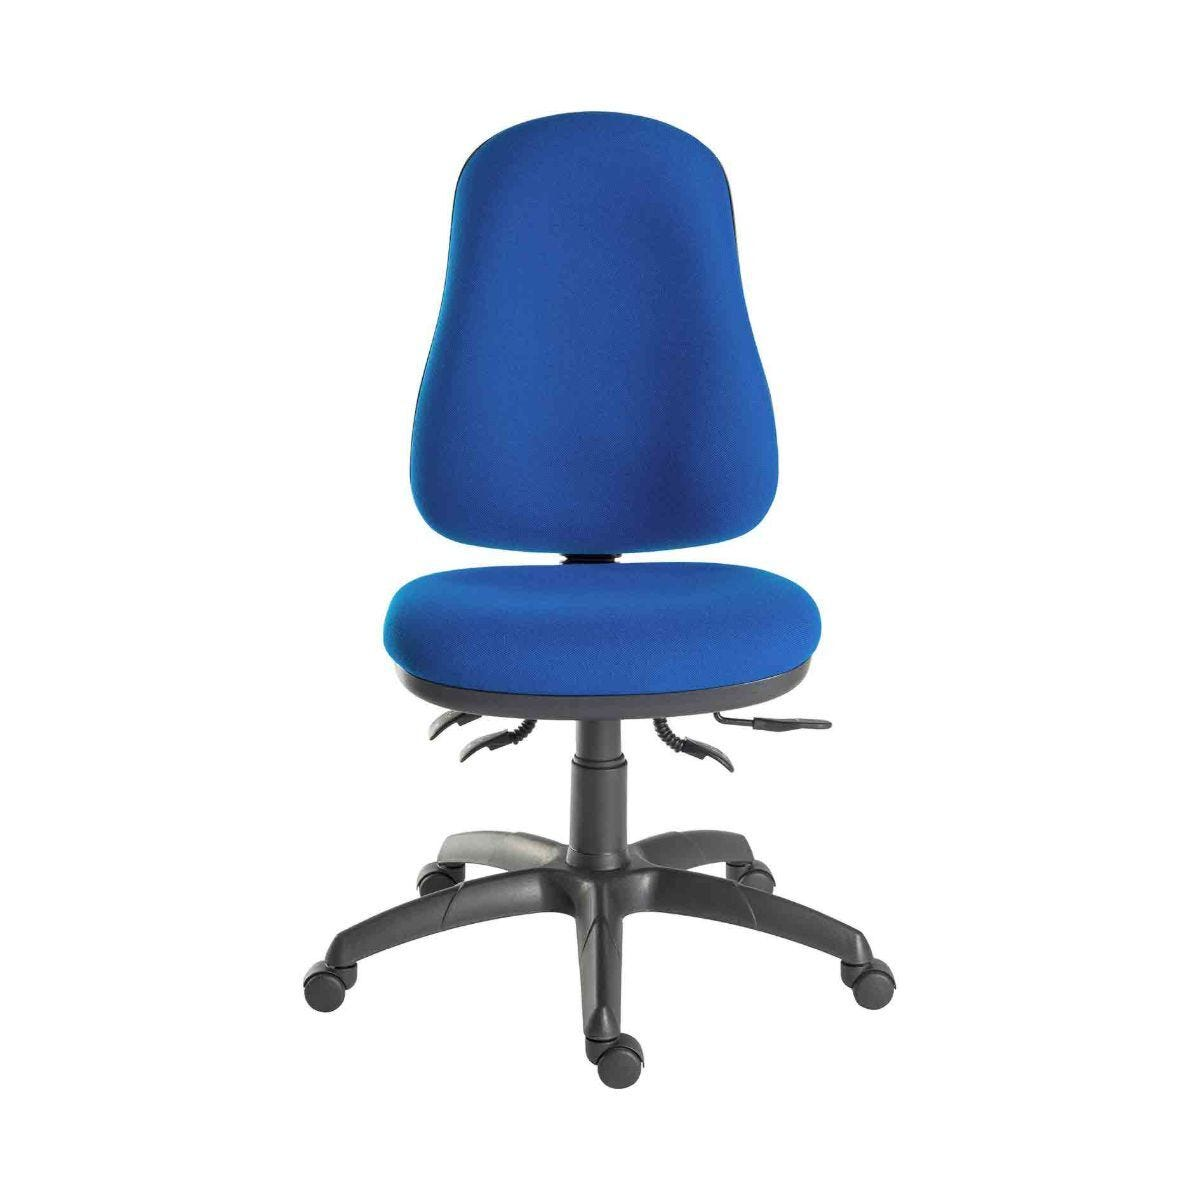 Teknik Office Ergo Comfort Fabric Chair